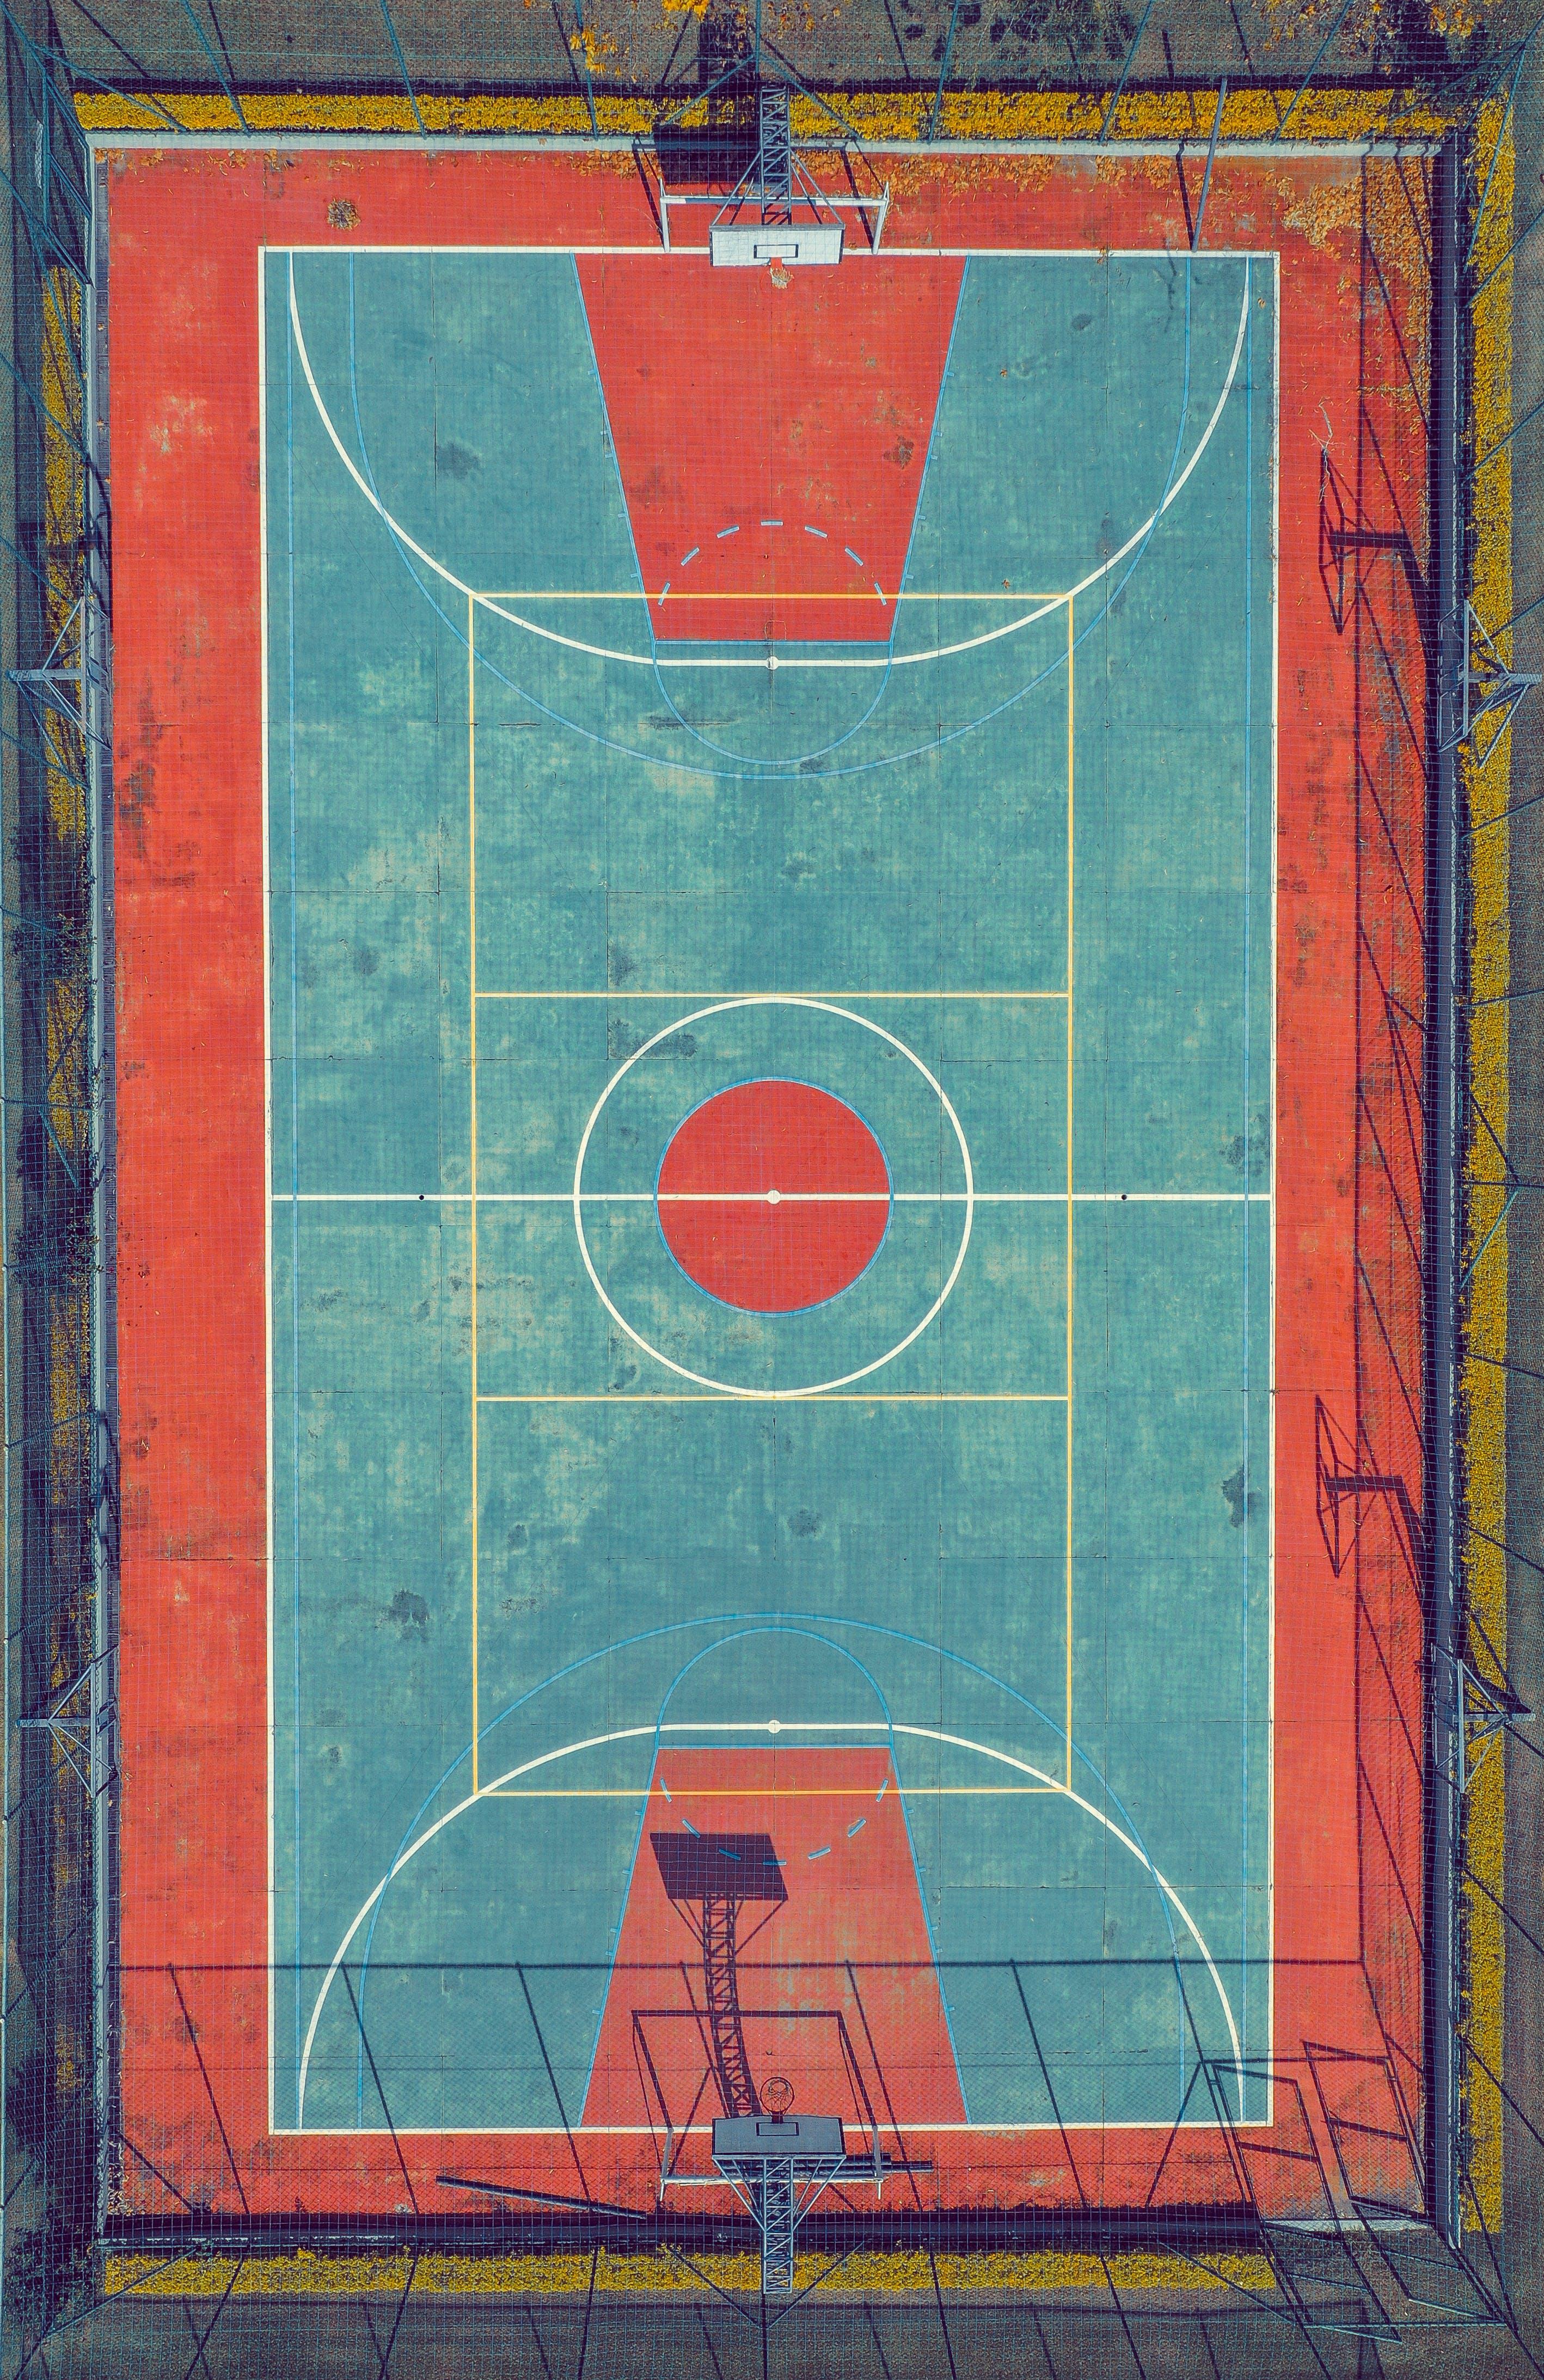 Kostenloses Stock Foto zu aufsicht, basketball platz, drohne blick, drohne erschossen